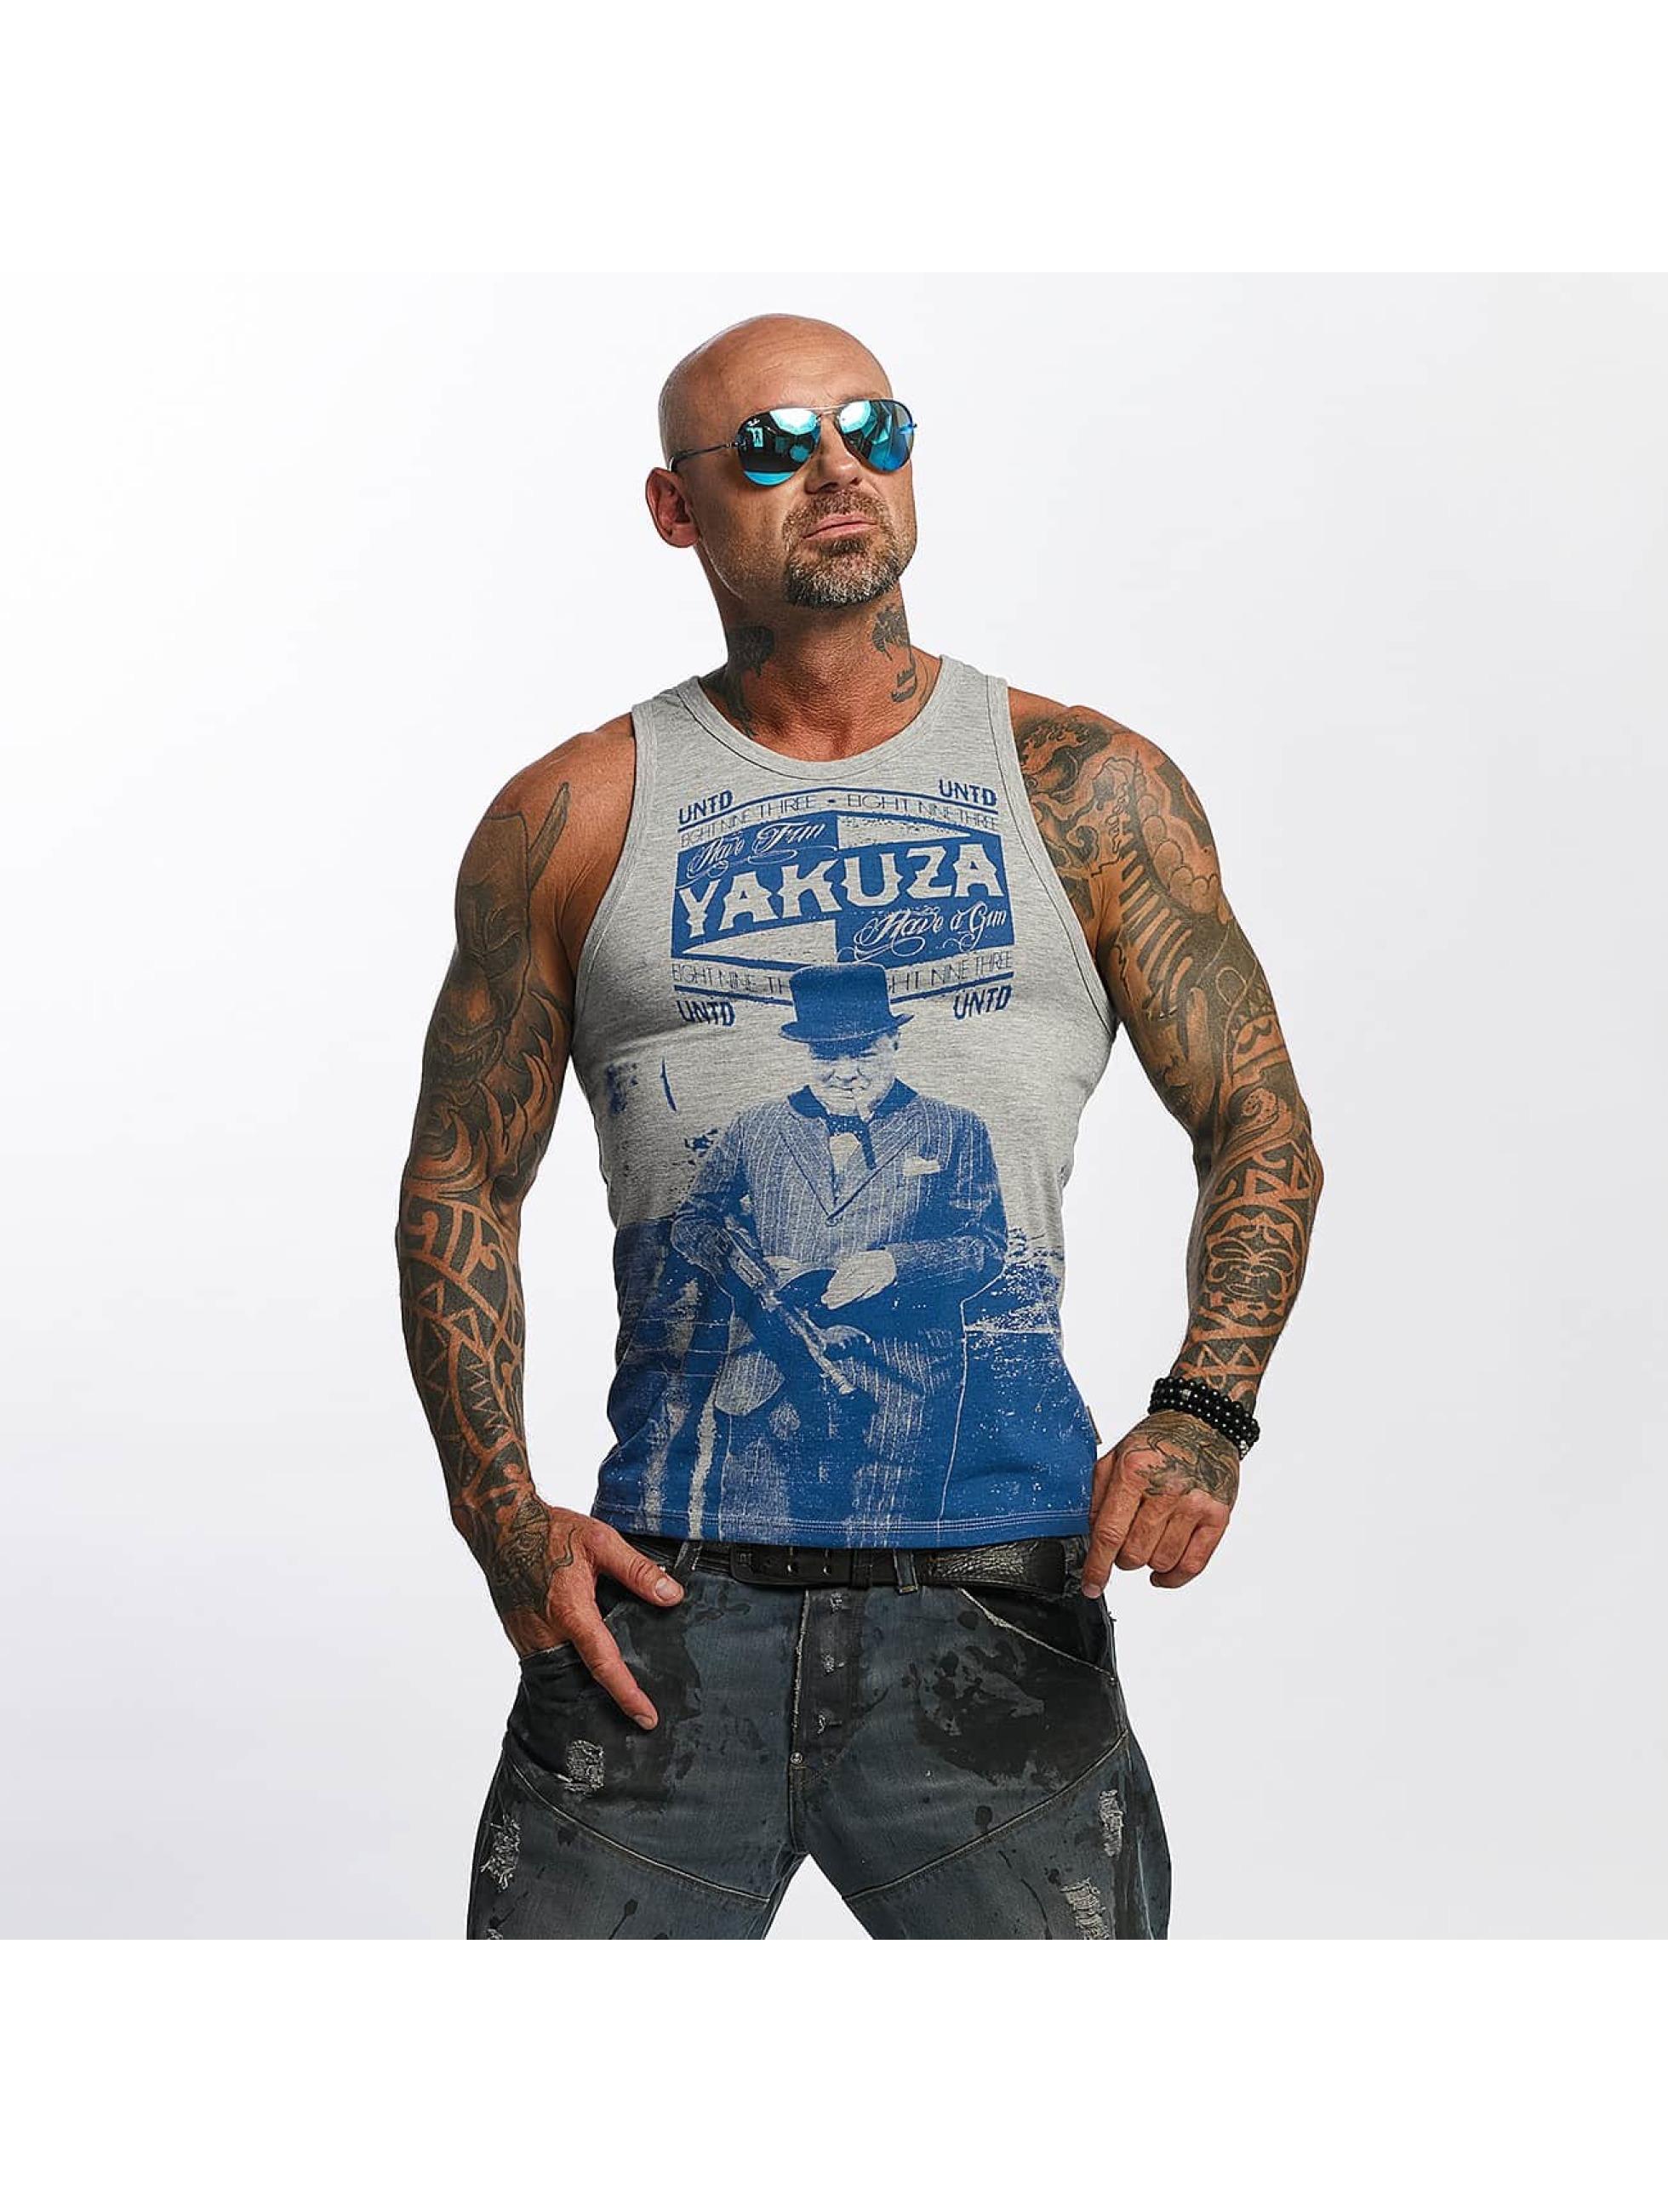 Yakuza Tank Tops Untd grau